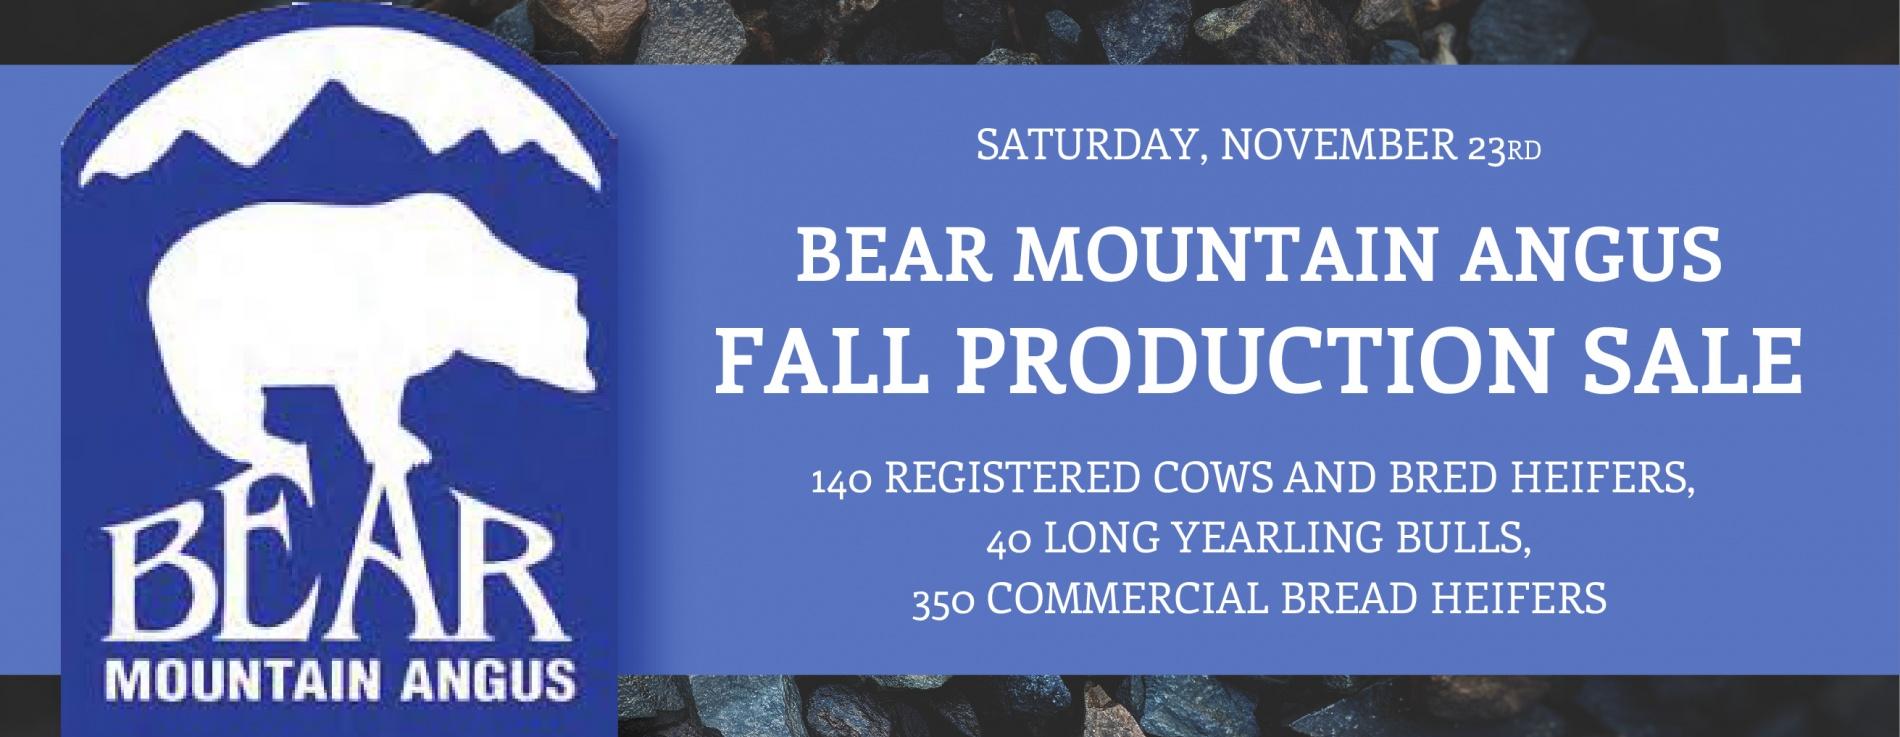 Bear Mountain Angus Ranch Fall Production Sale